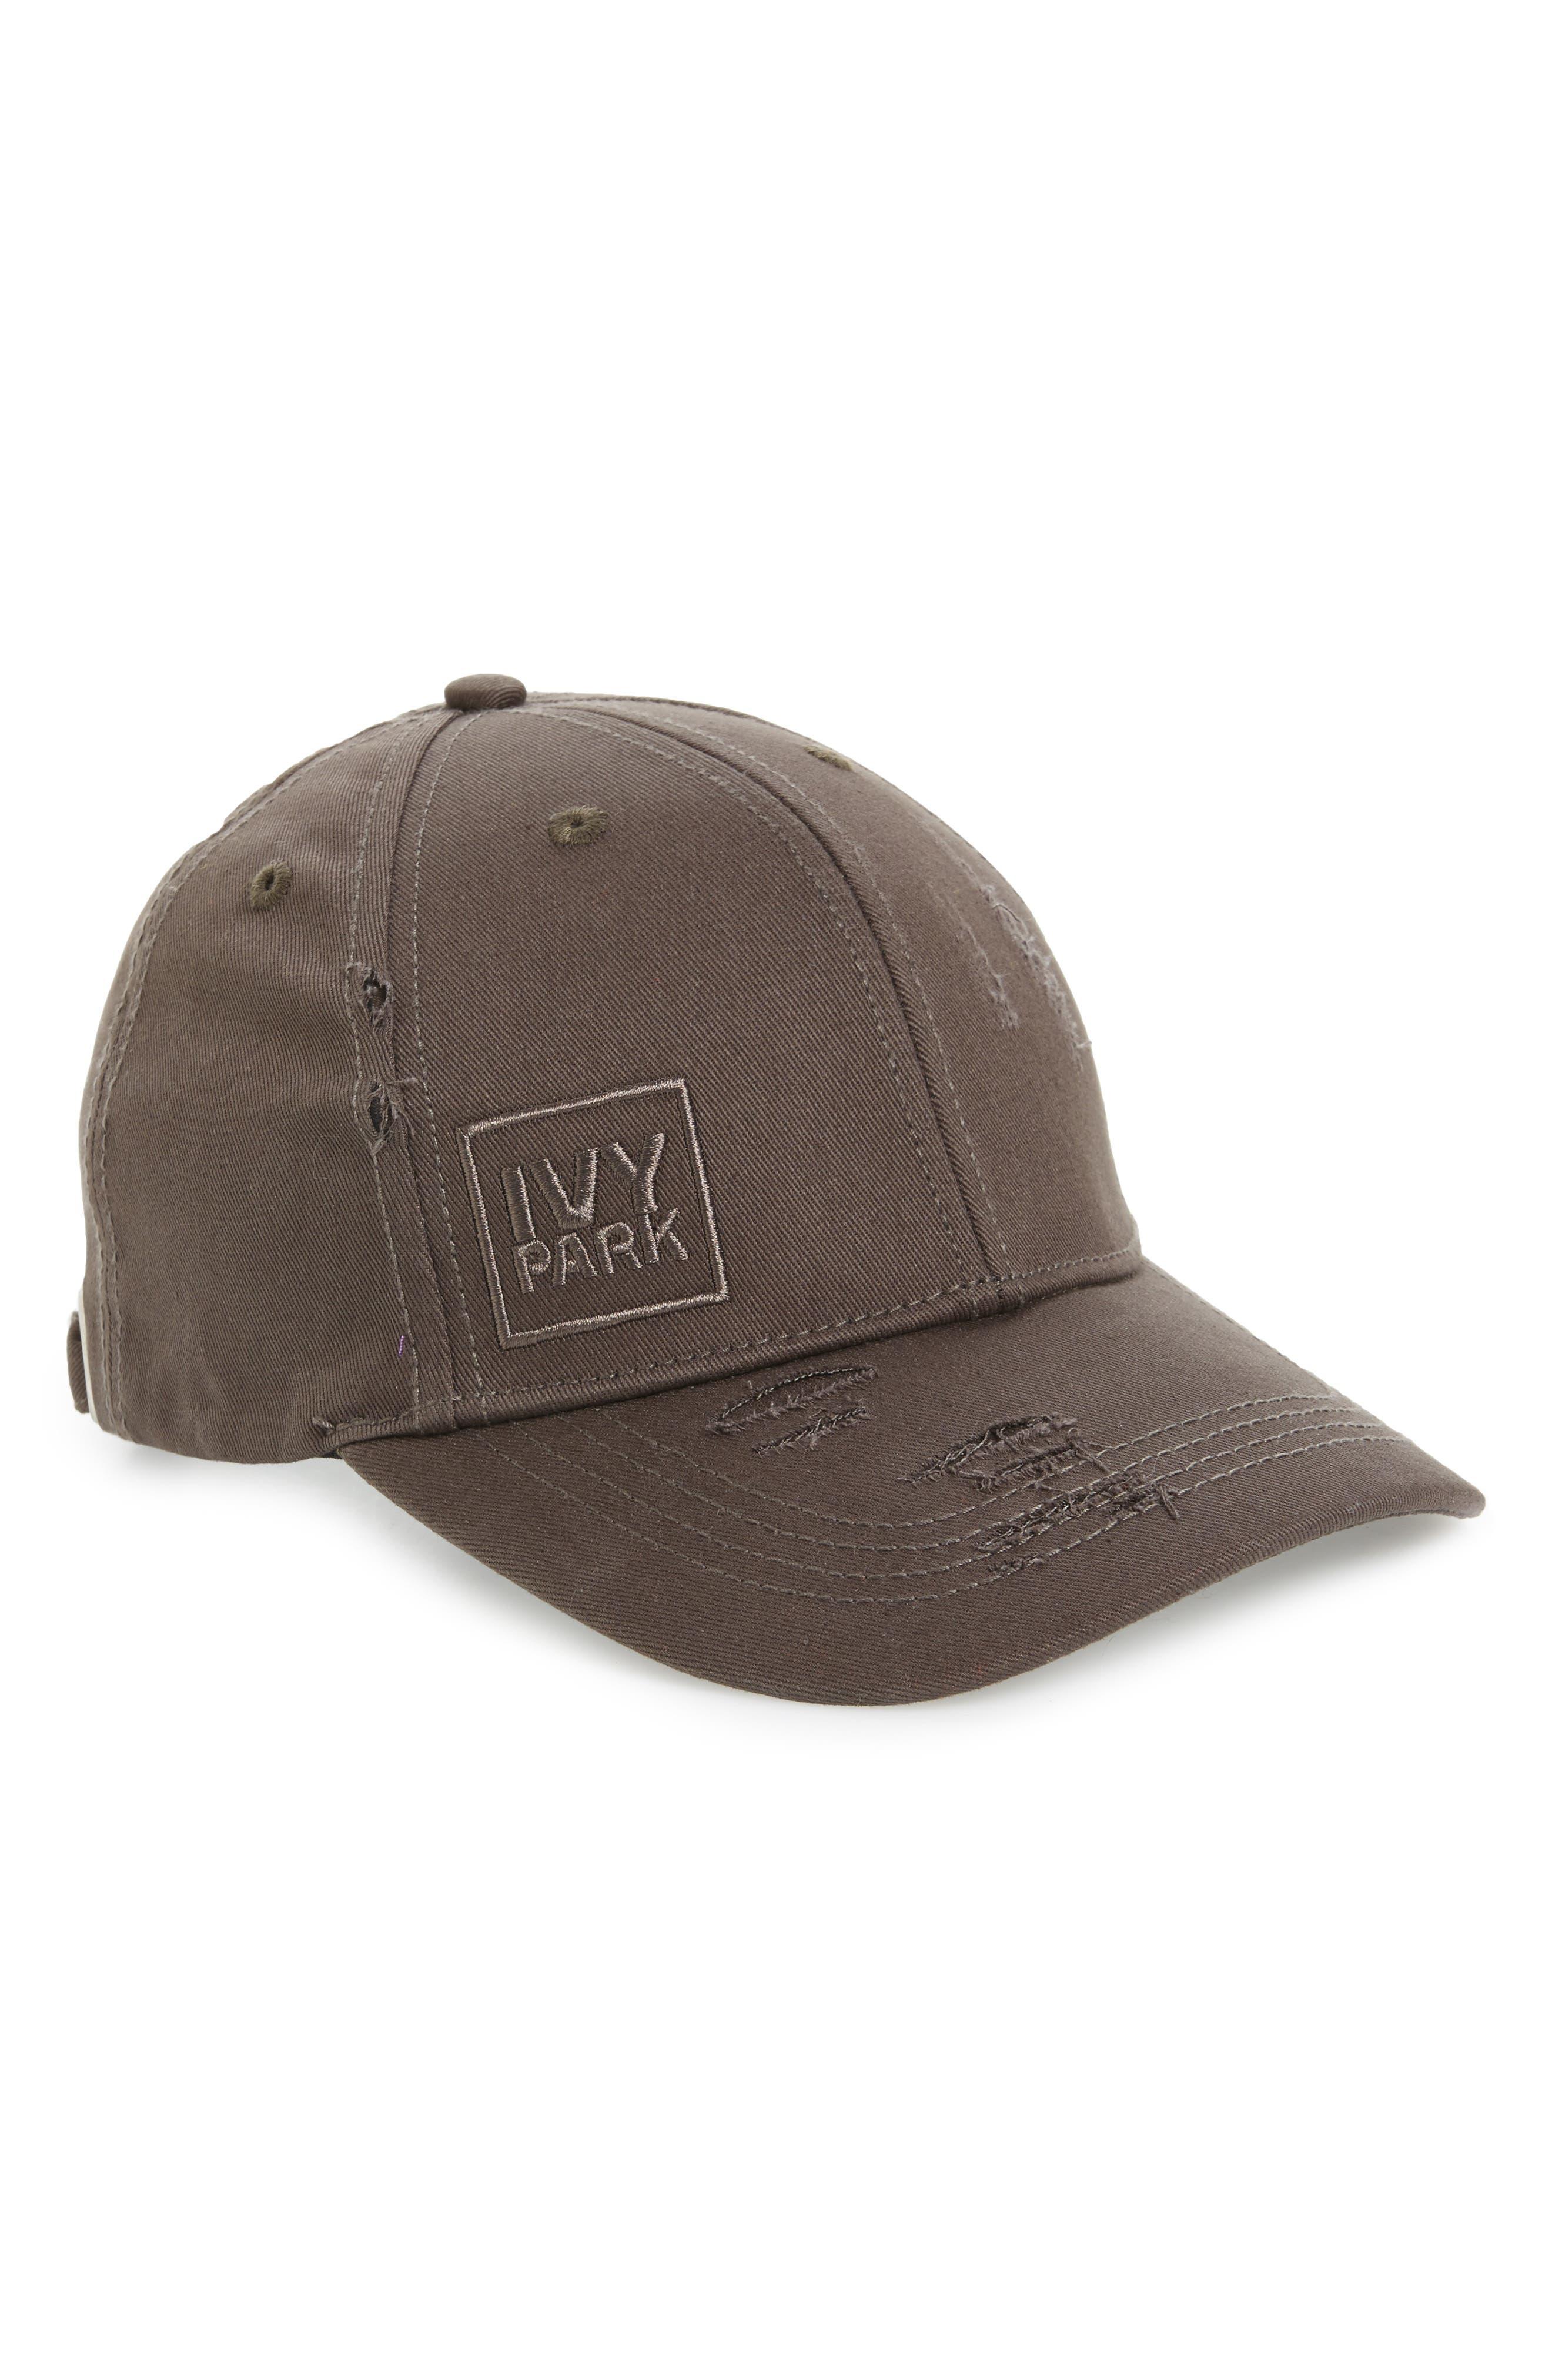 IVY PARK® Distressed Baseball Cap